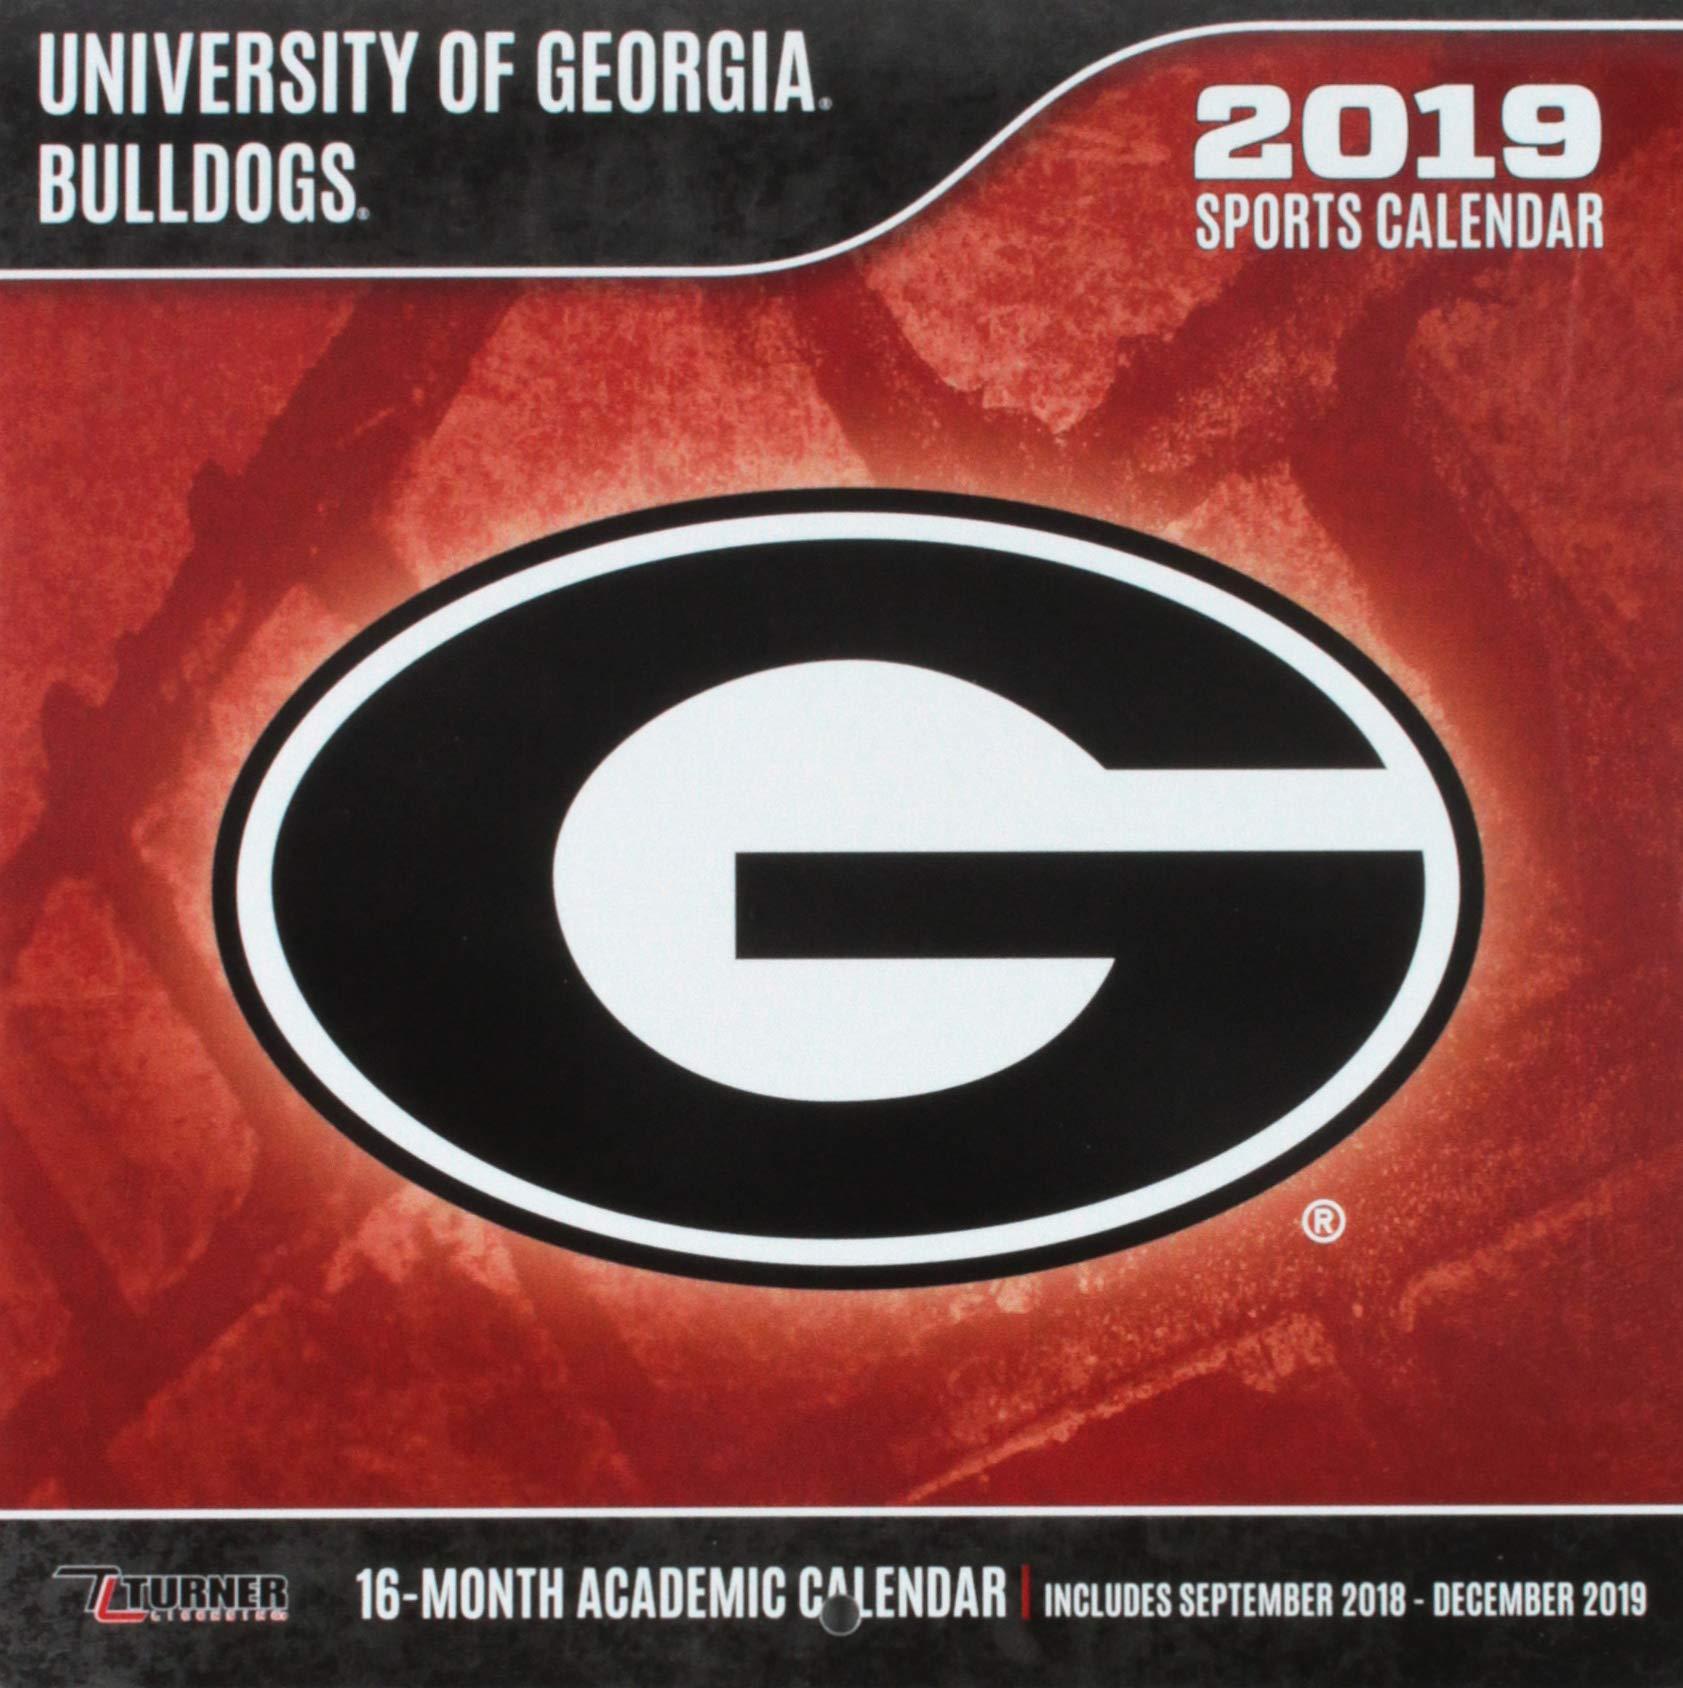 University Of Georgia Calendar 2019 University of Georgia Bulldogs 2019 Sports Calendar: Inc. Lang